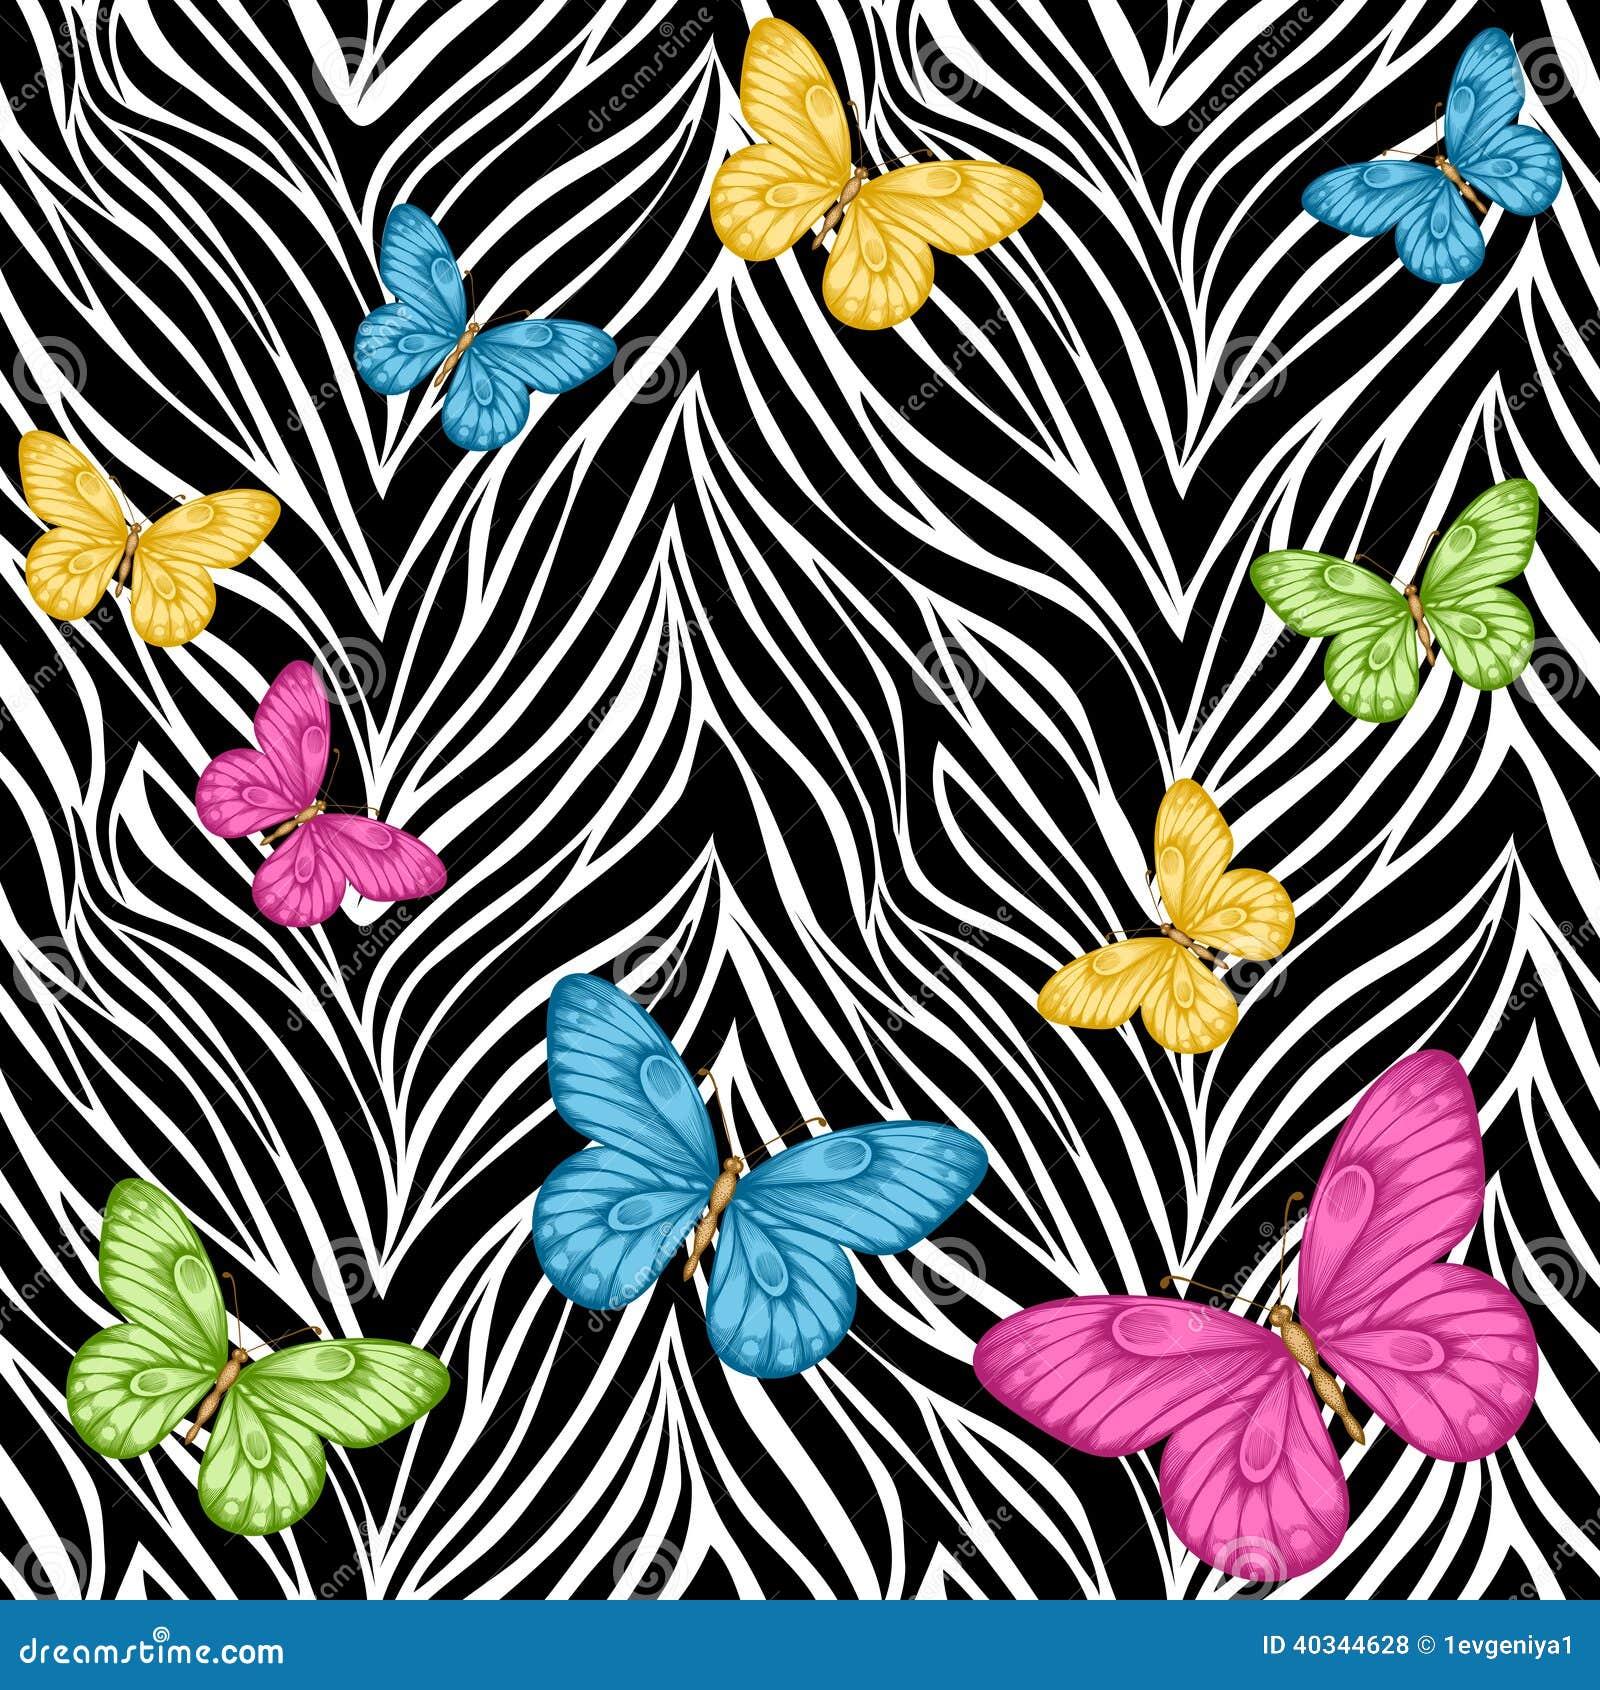 Zebra Print Invitations with adorable invitation layout